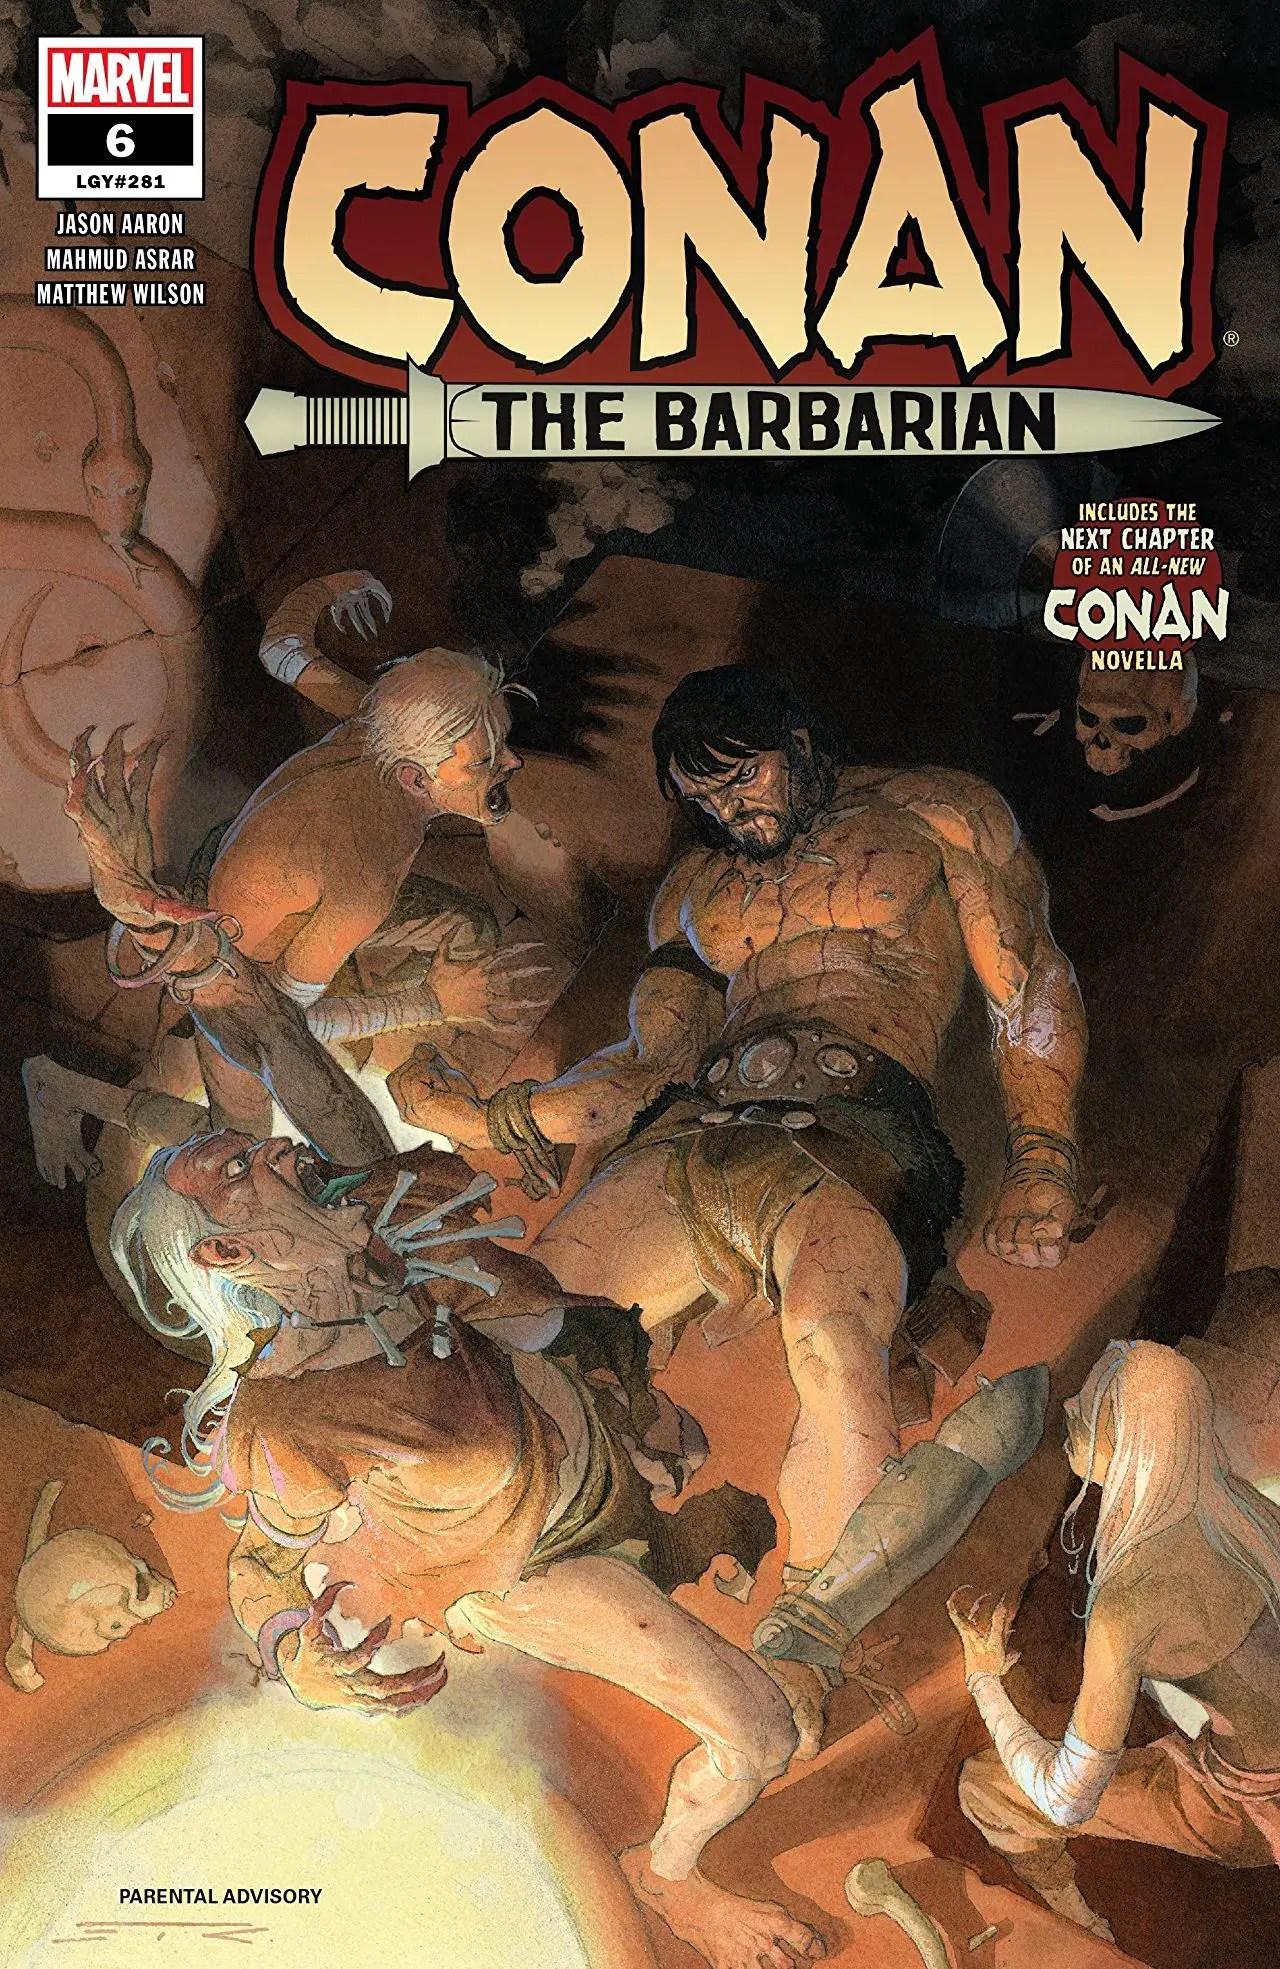 Conan the Barbarian #6 Review: The Sole Survivor